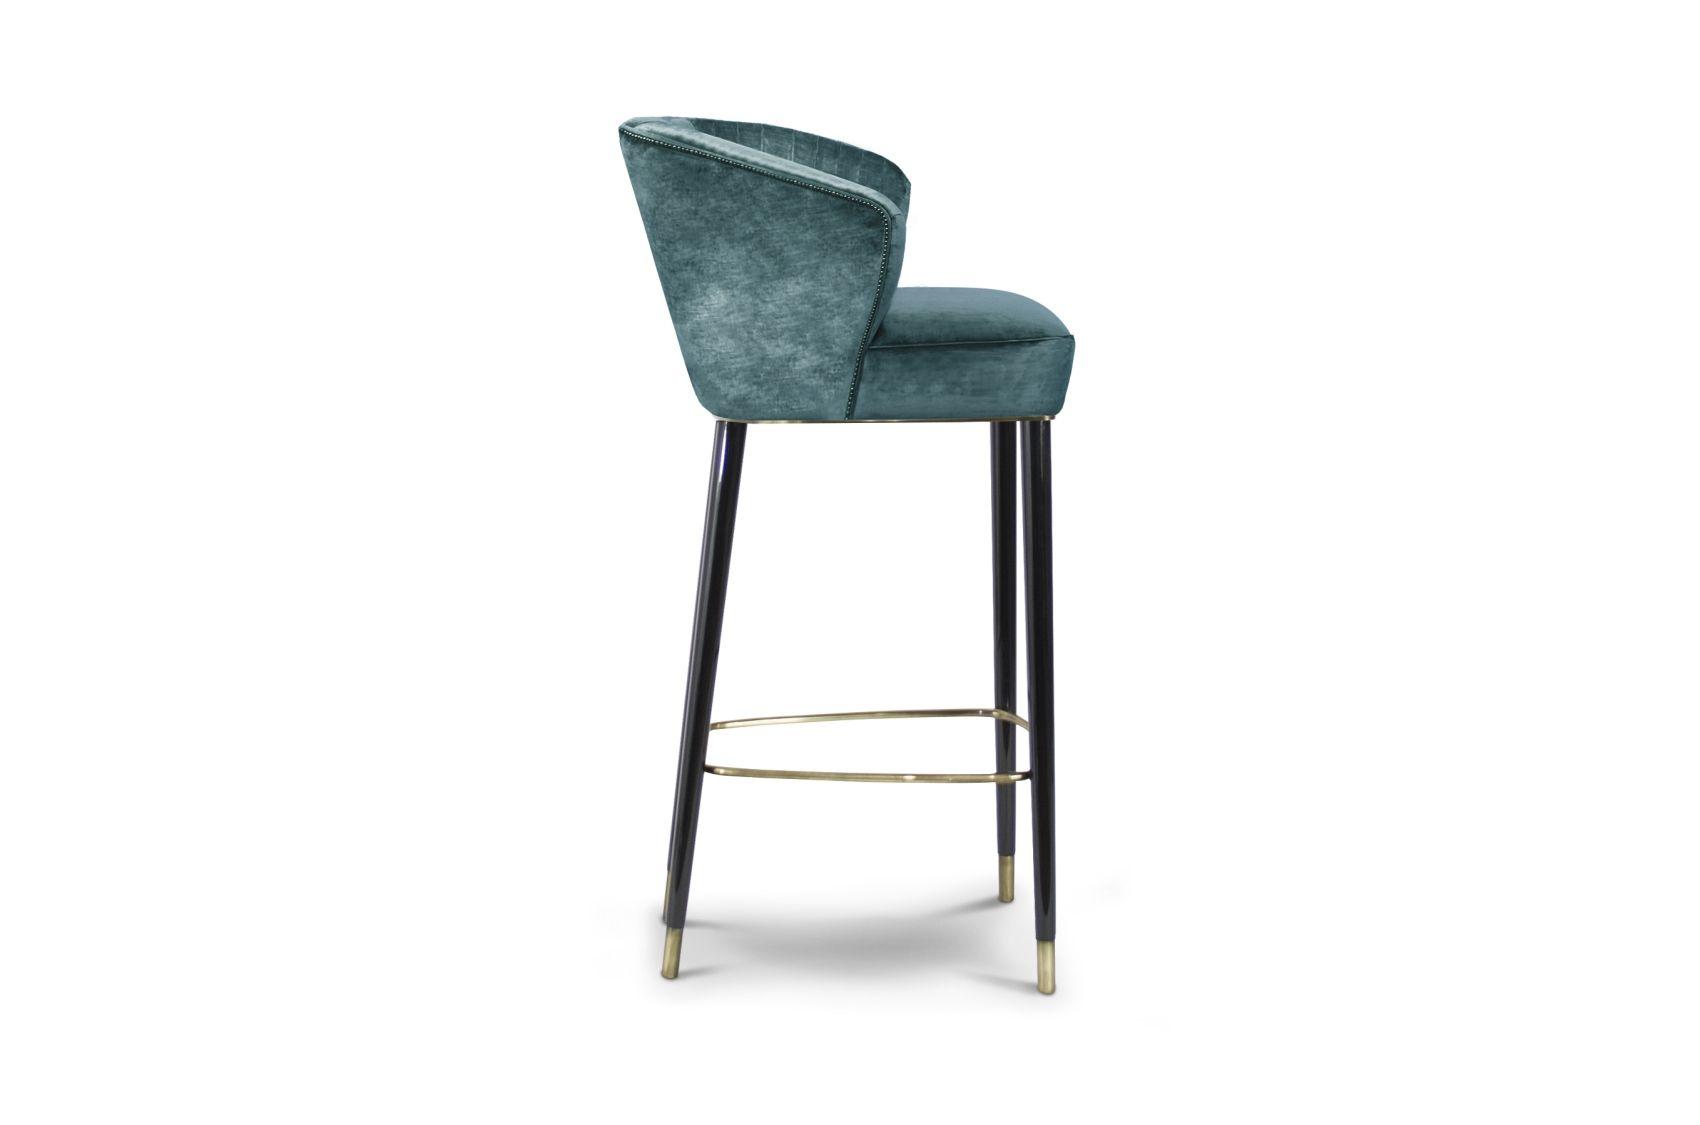 Brabbu Barhocker Bar Chair Nuka In 2020 Moderne Barhocker Barhocker Barstuhle